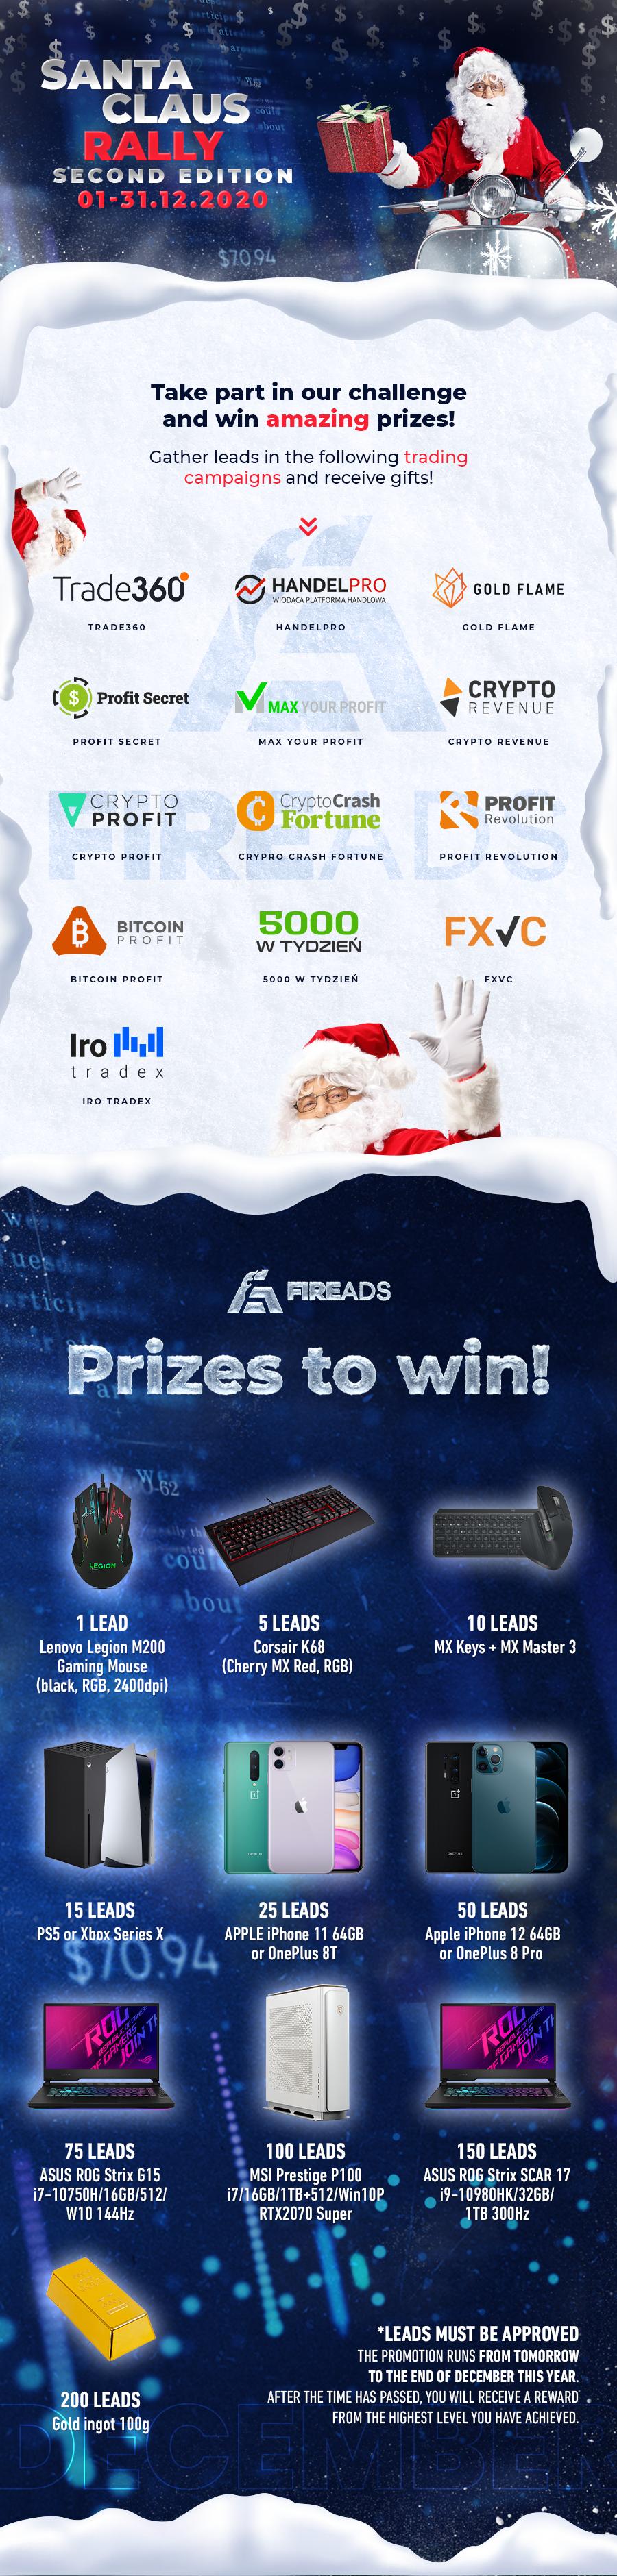 Santa Claus Raid FireAds Competition - Rules